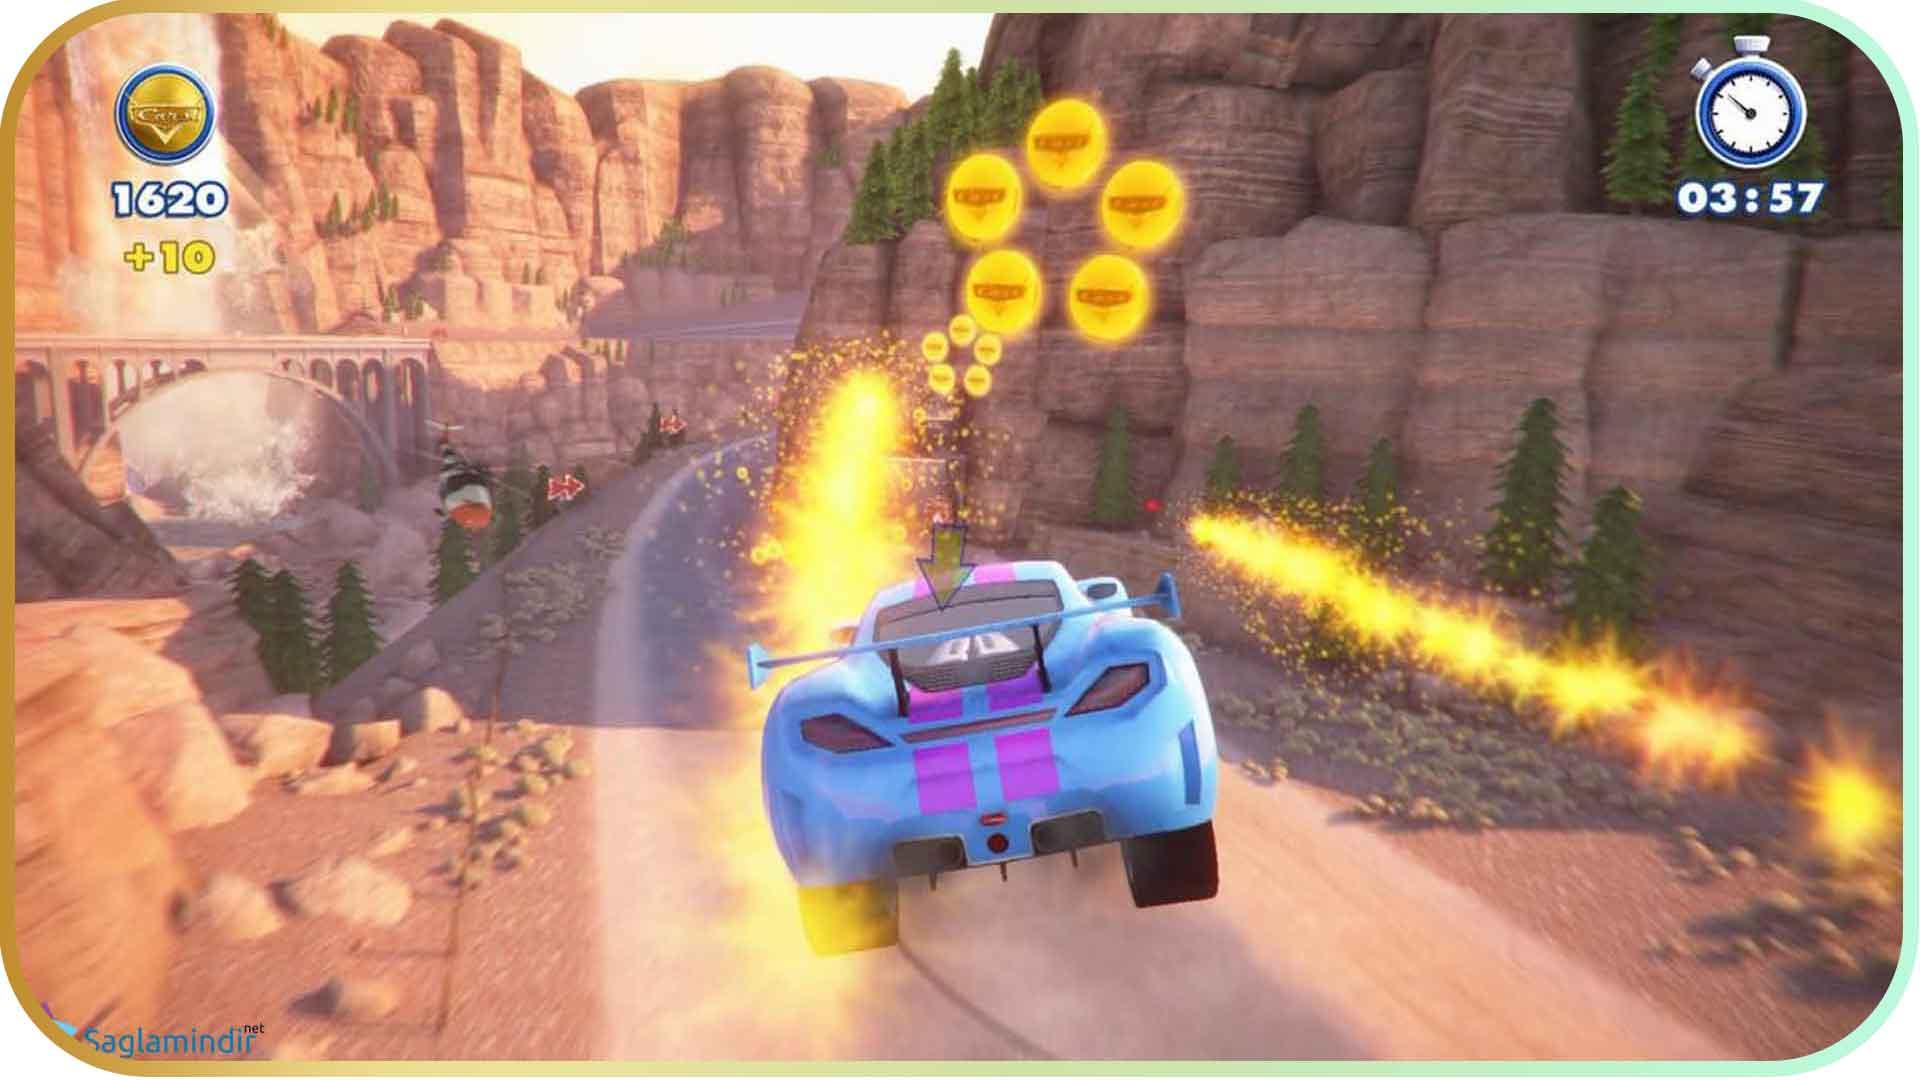 Rush A Disney Pixar Adventure saglamindir